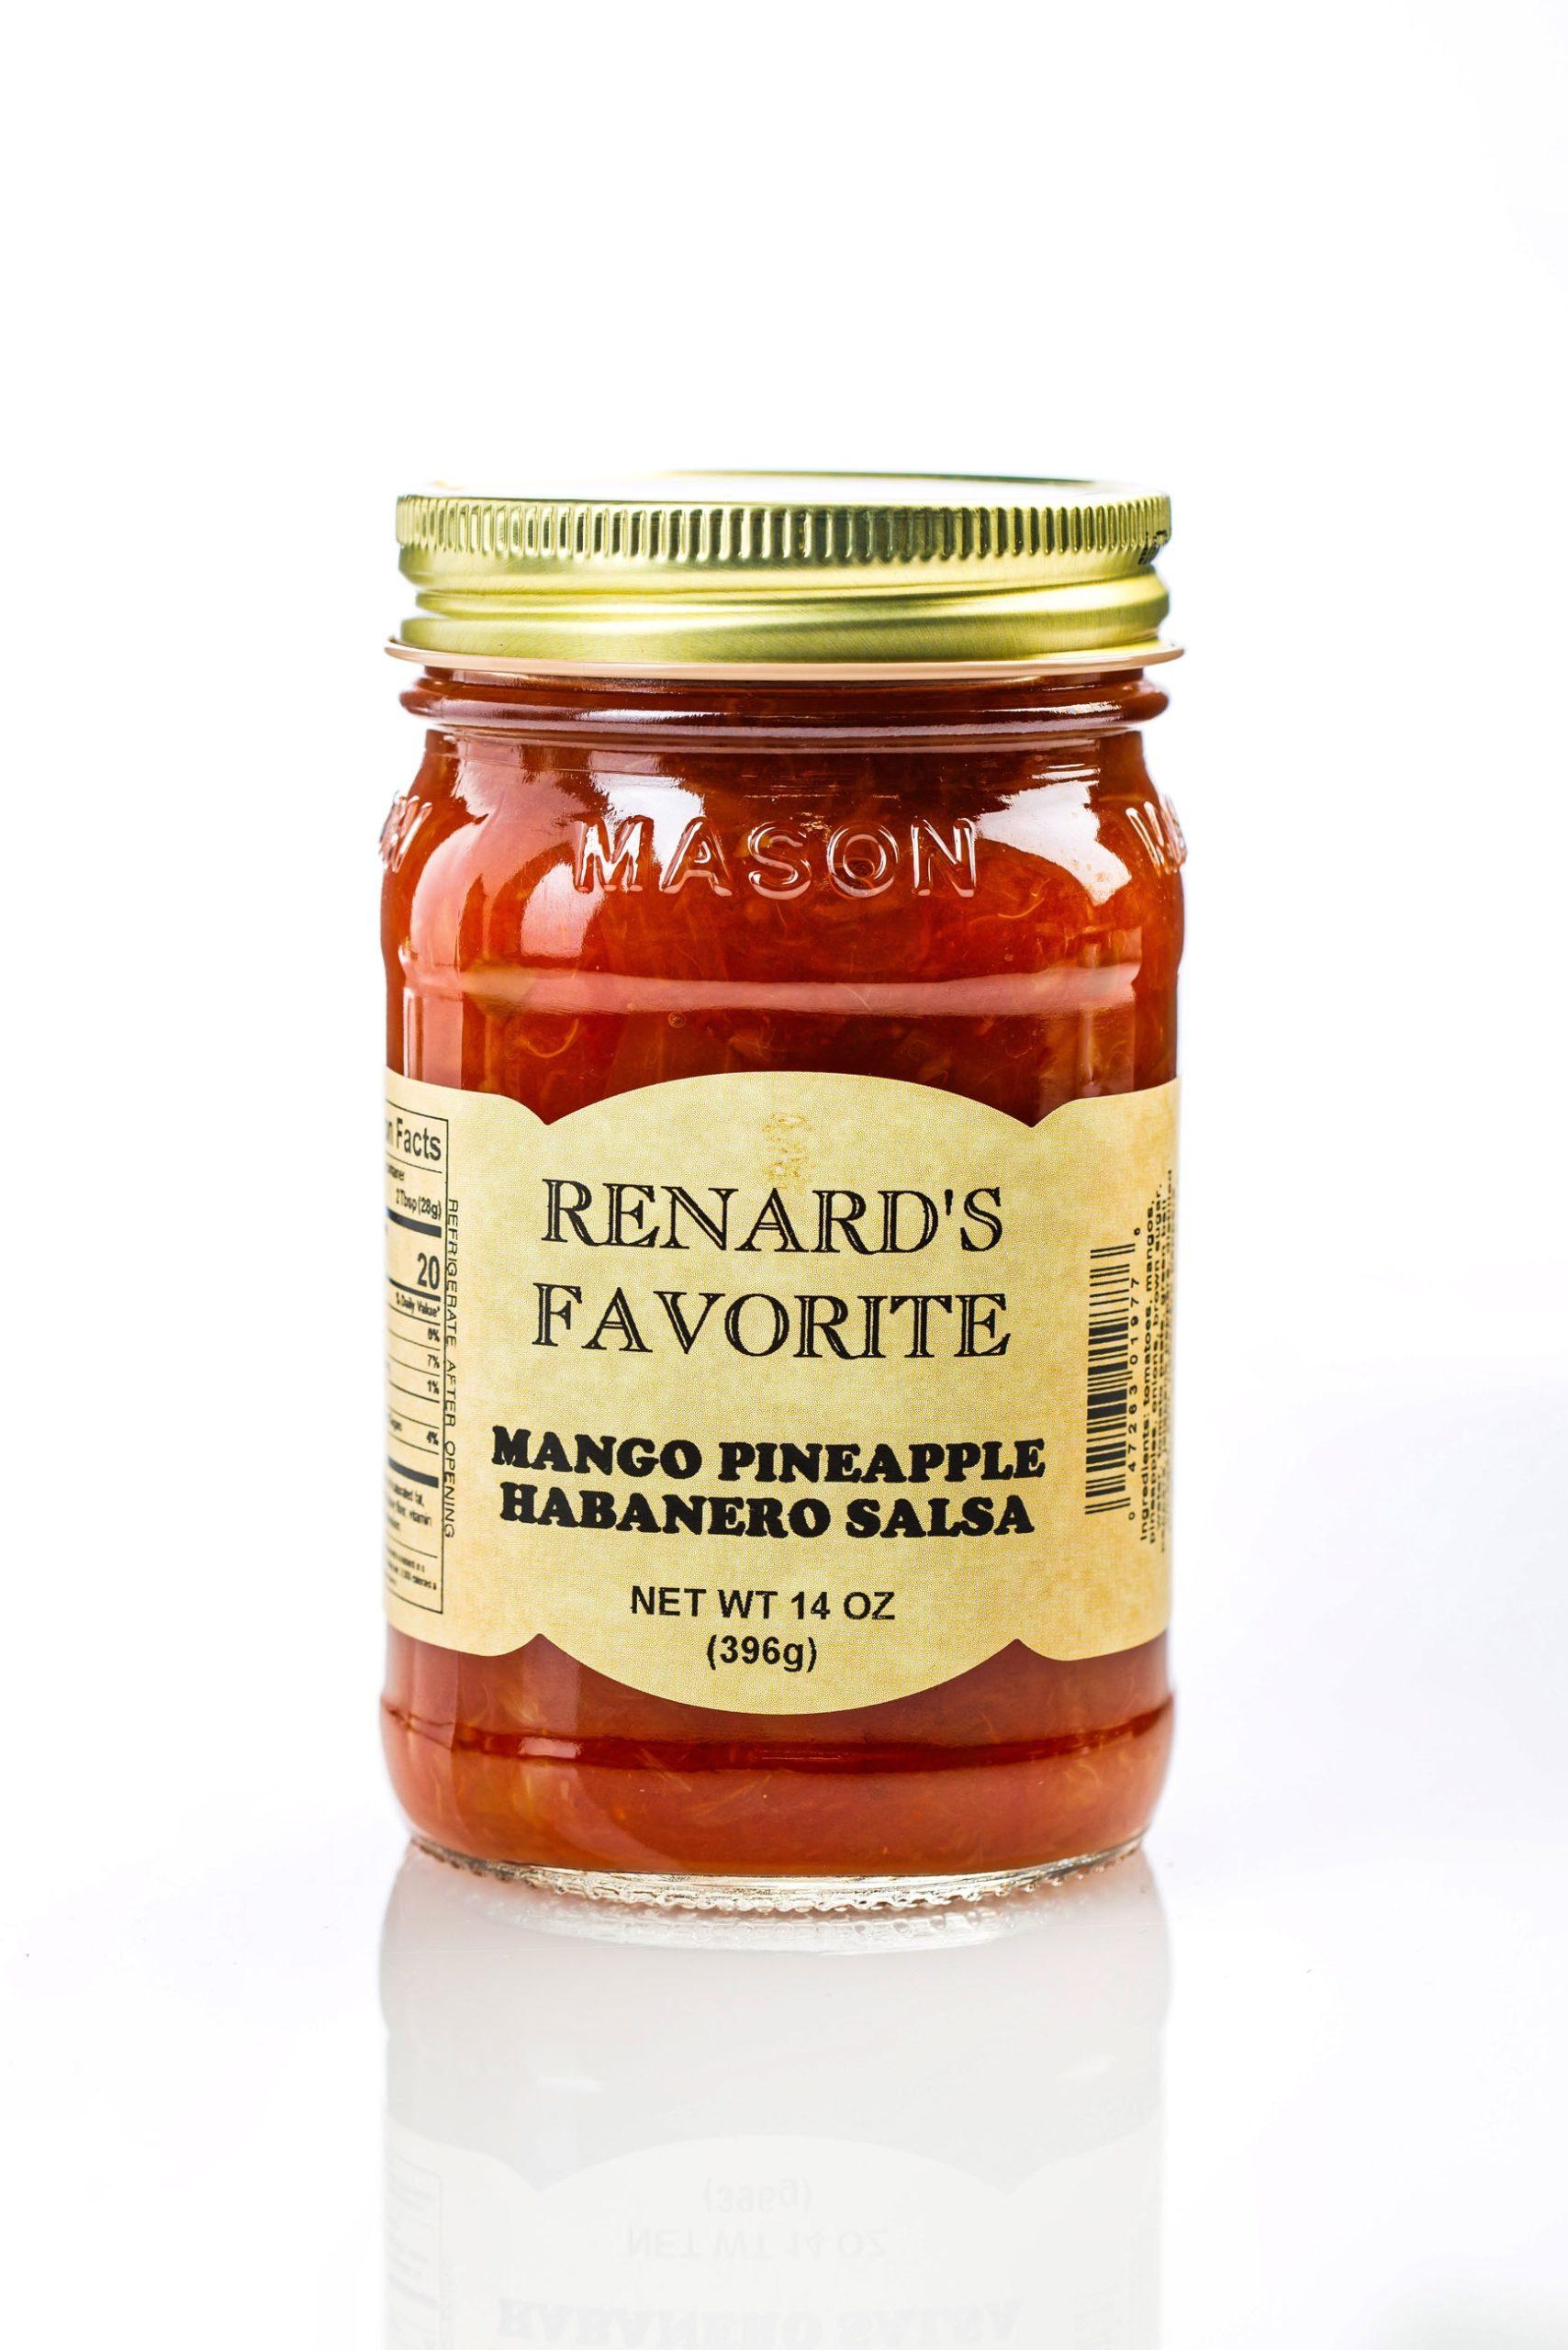 Mango Pineapple Habanero Salsa - Renard's Favorite-0